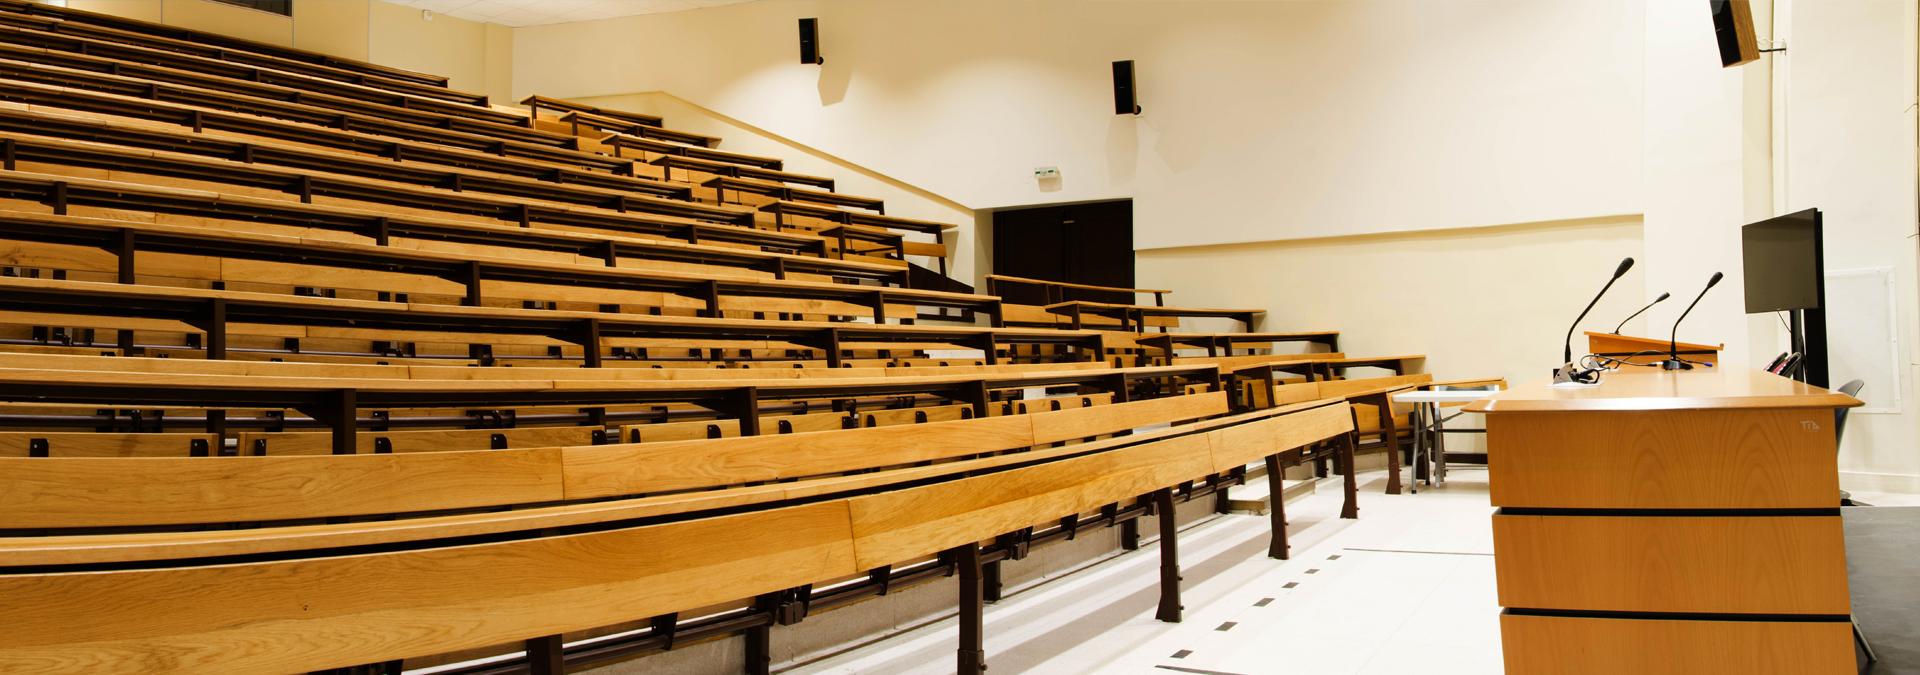 location salle universite paris descartes